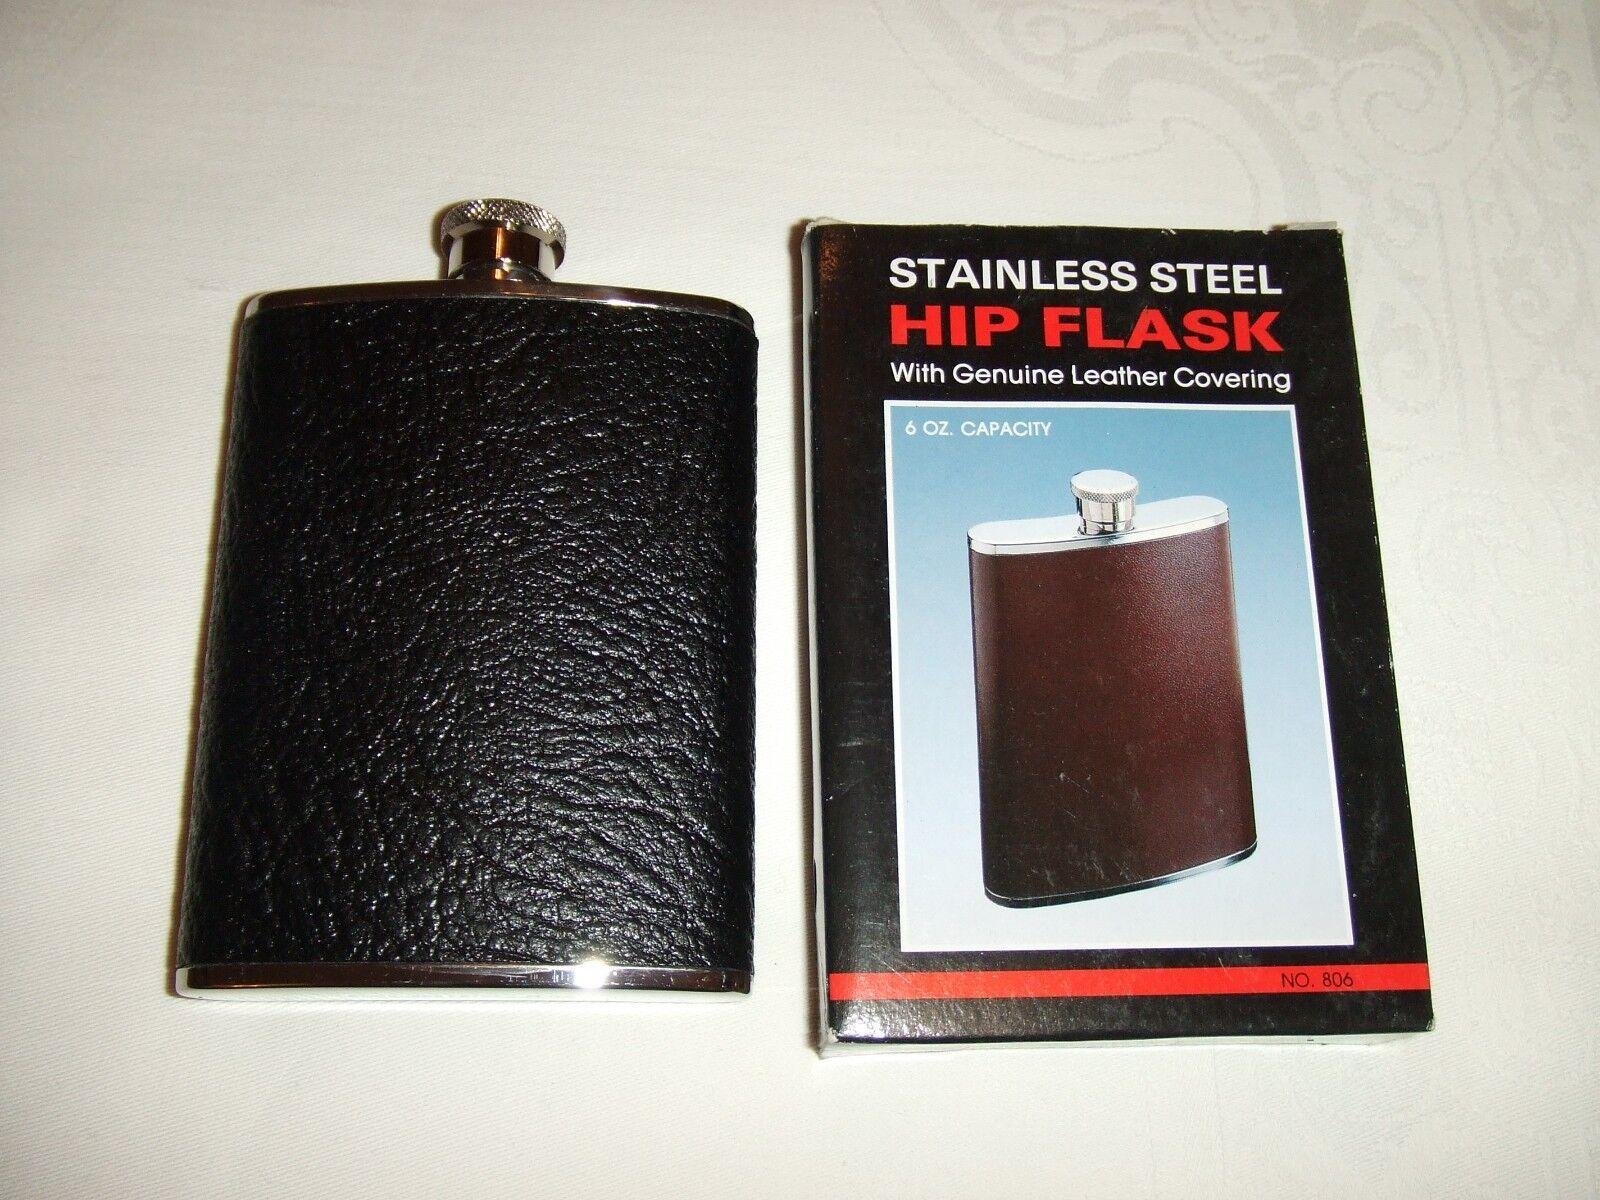 En cuir noir/acier noir/acier noir/acier inoxydable 6 oz (environ 170.09 g) capacité Hip Flask 2a8f77